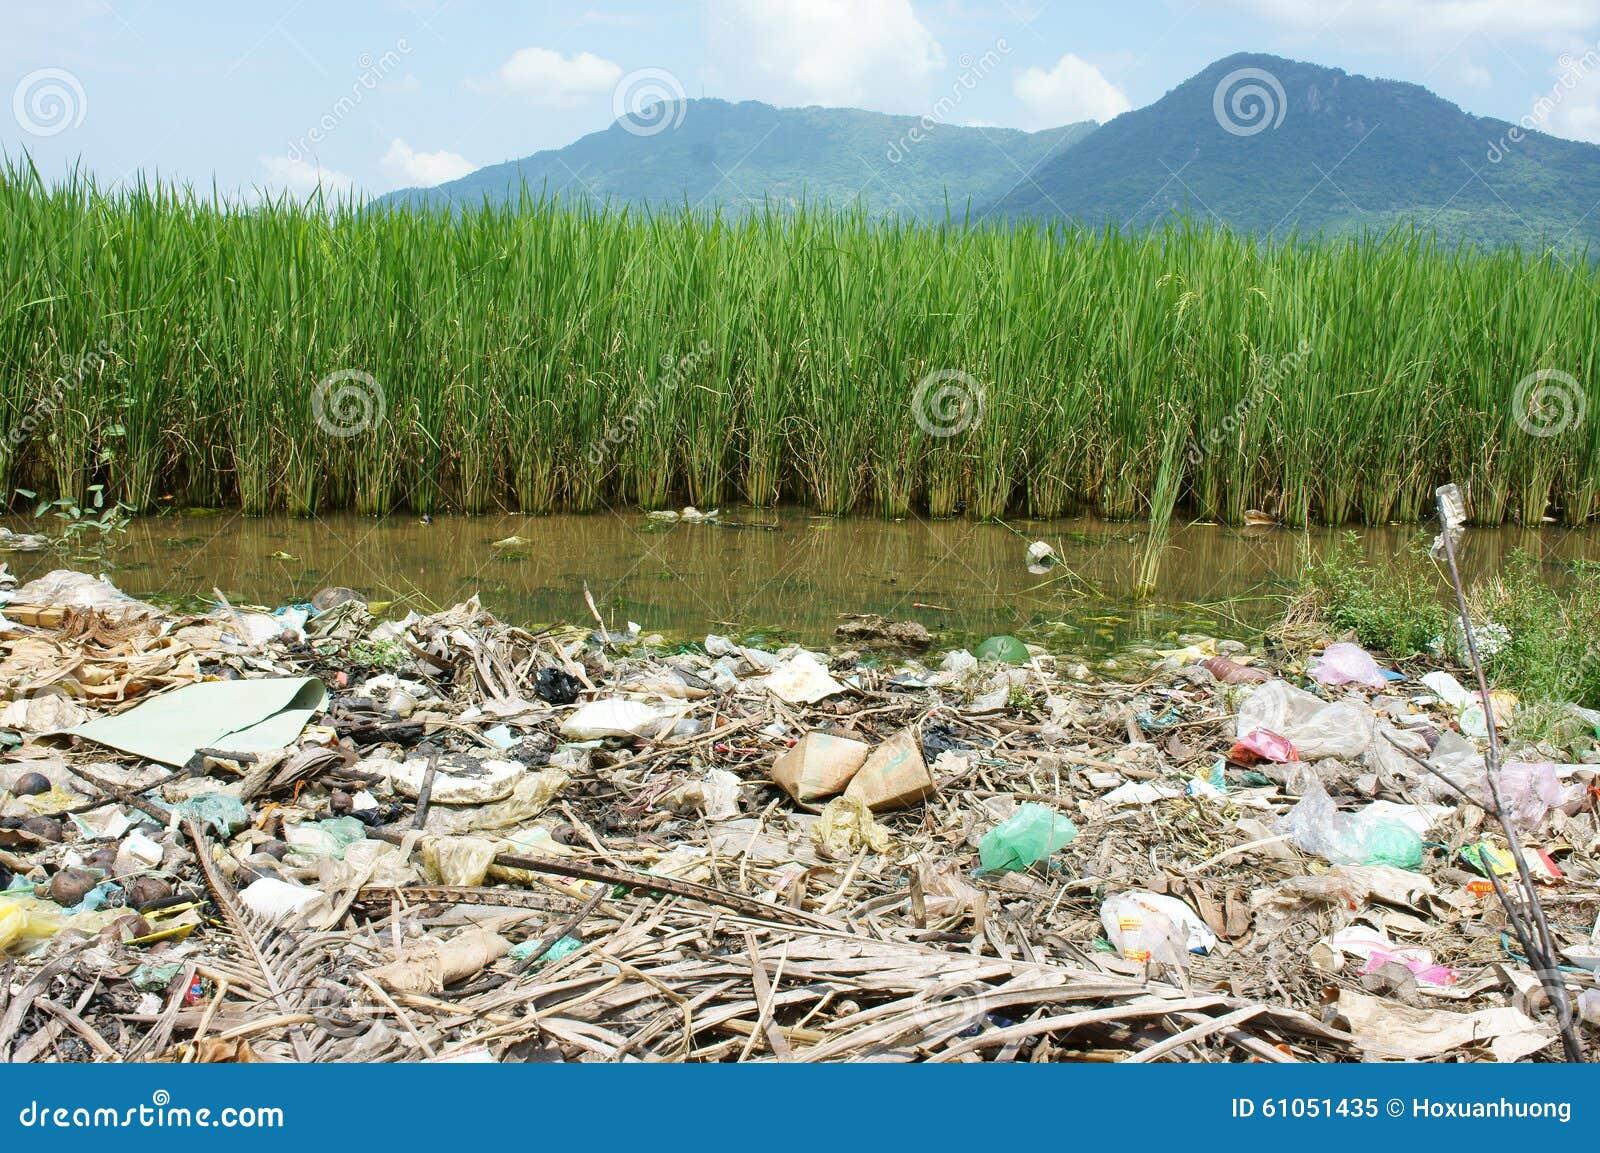 download 环境问题,垃圾填埋,农田,被污染 库存图片.